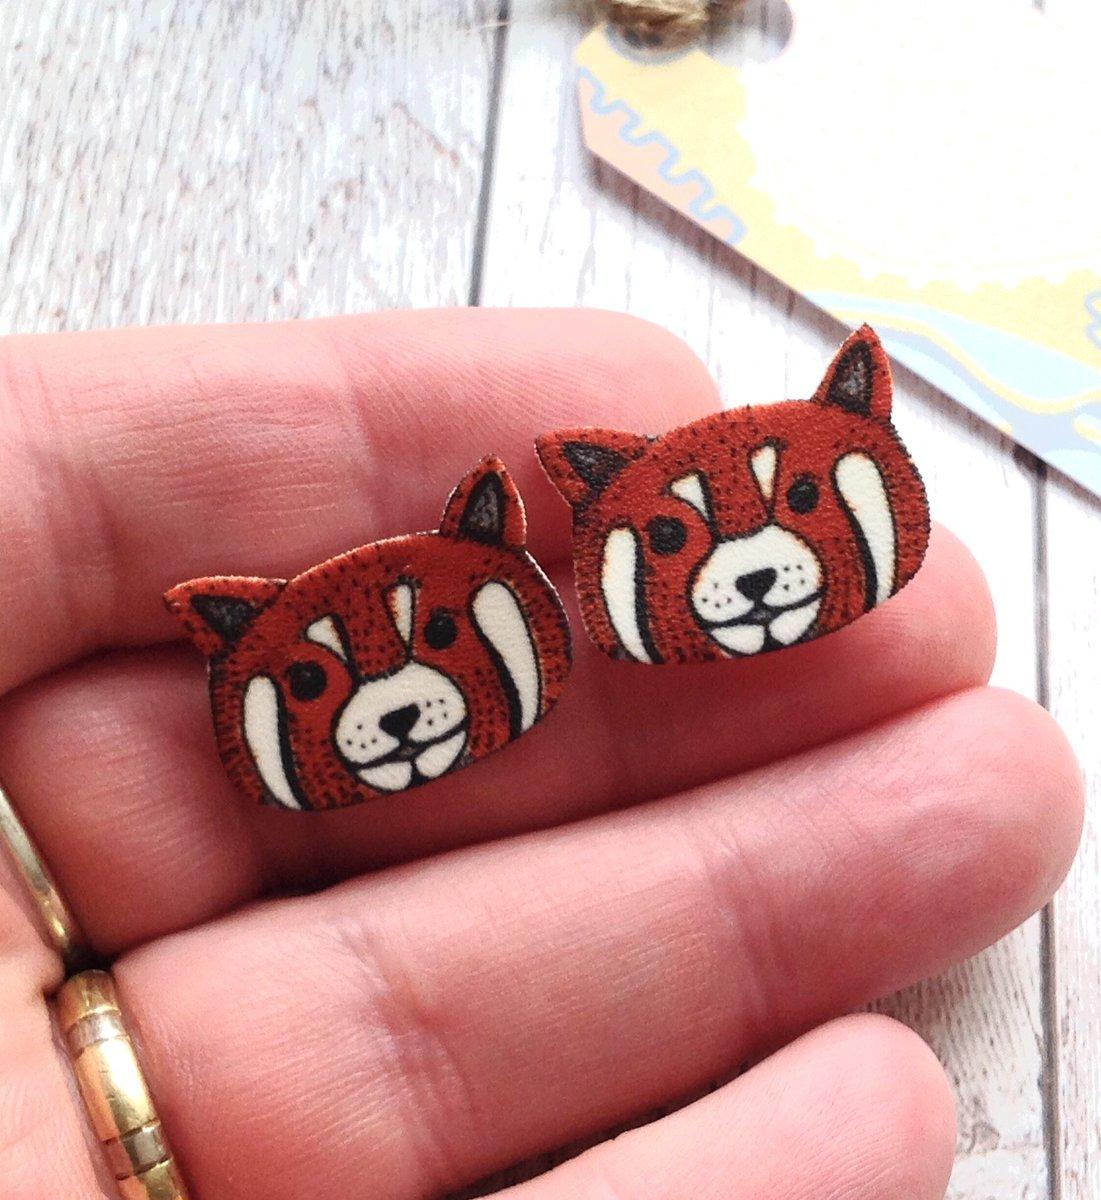 Jewelry Panda Stud Earrings Red Panda Stud Earrings Red Panda Earrings Animal